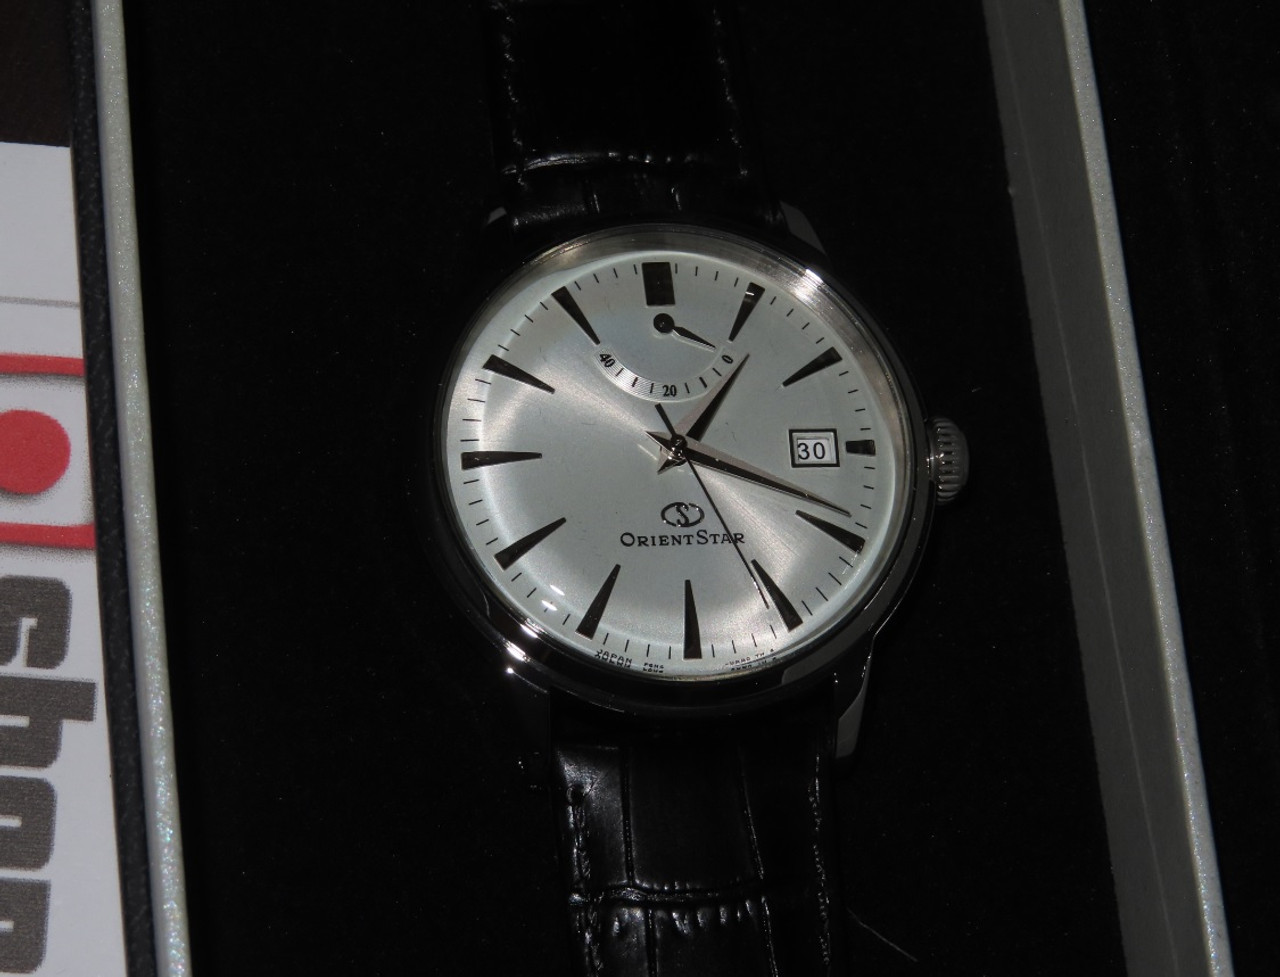 Orient Star Classic 2nd Gen RK-AF0002S